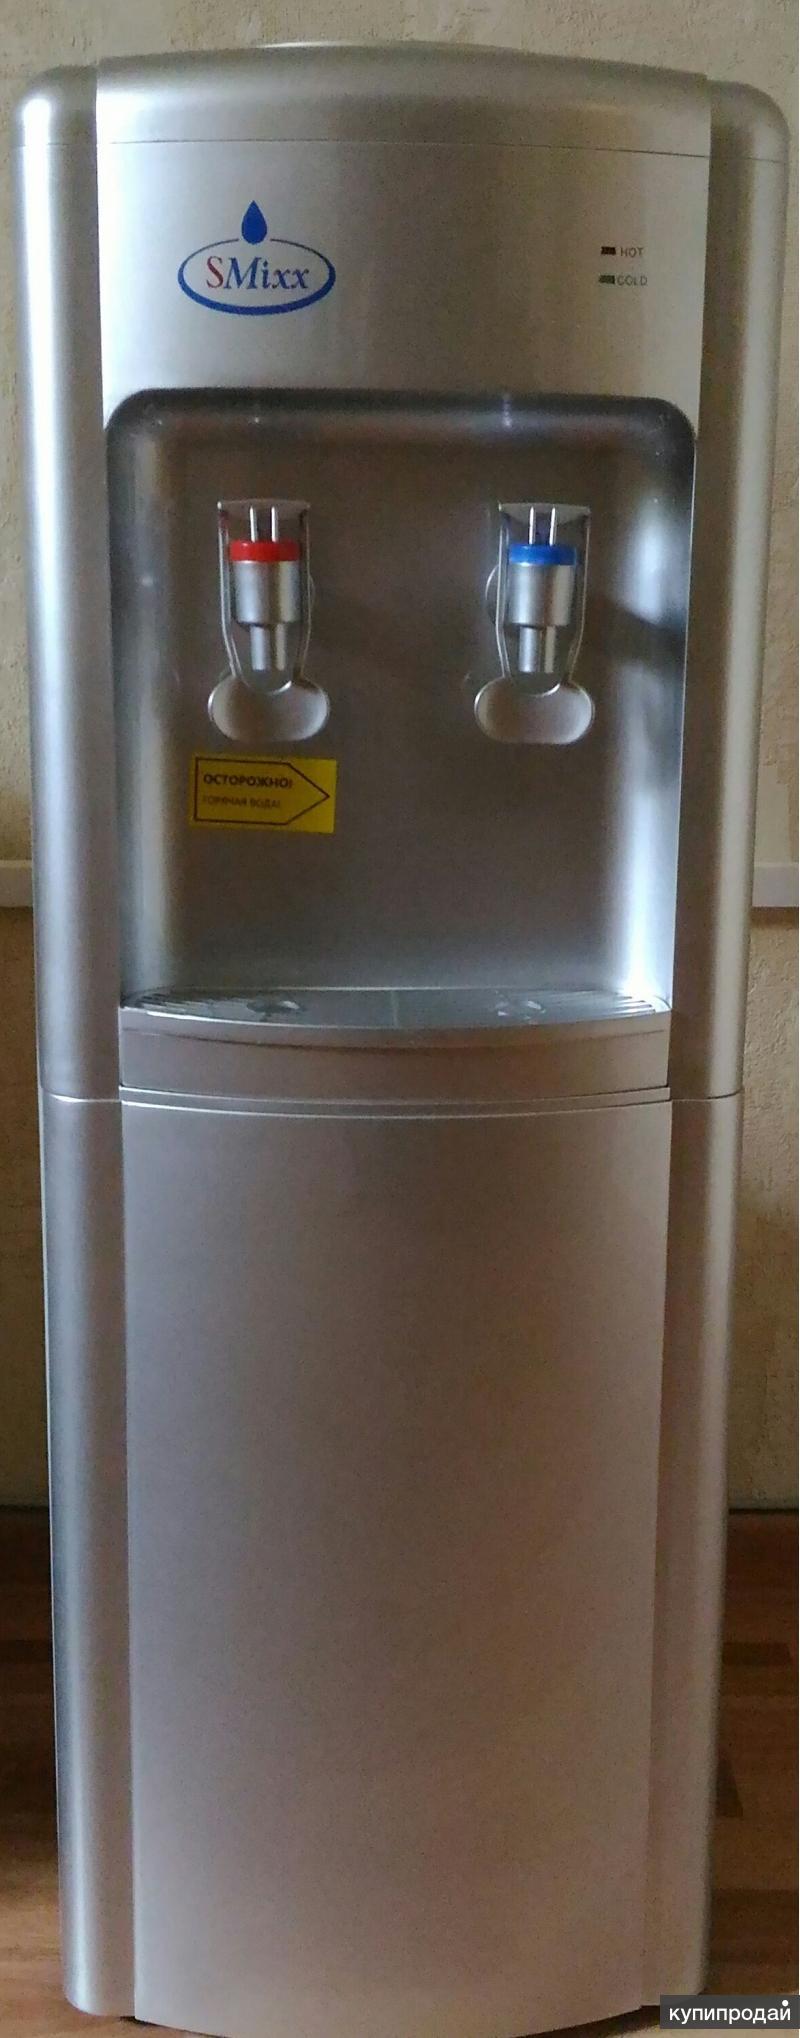 Кулер для воды SMixx 09 LD,серебро